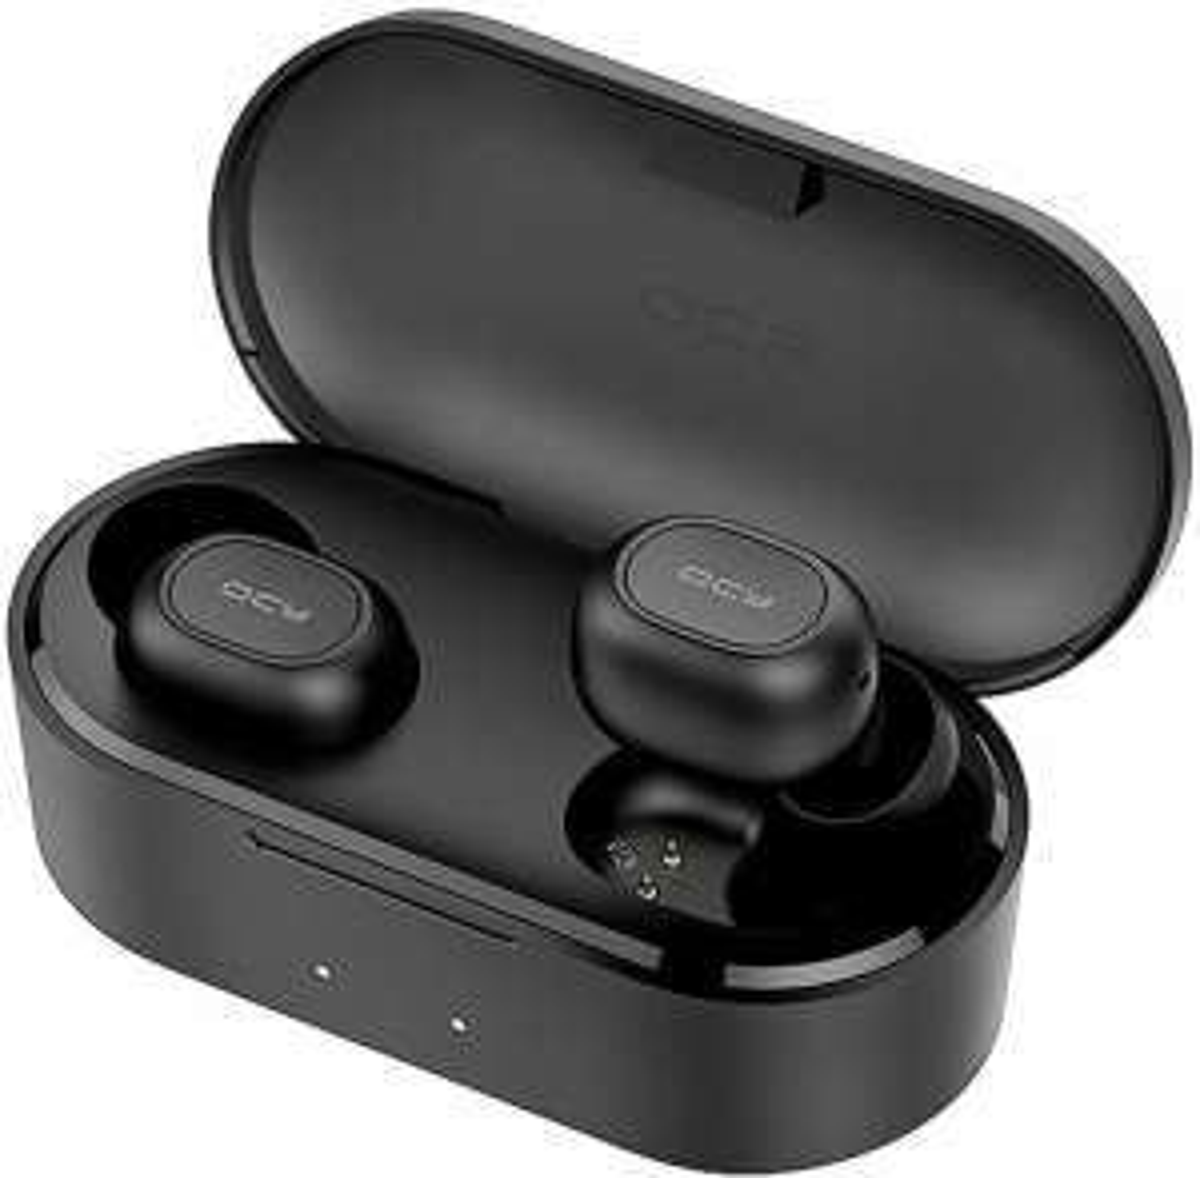 QCY T2C: TWS Kopfhörer (4h Akku, IPX4, 800mAh Ladebox, Geräuschunterdrückung)